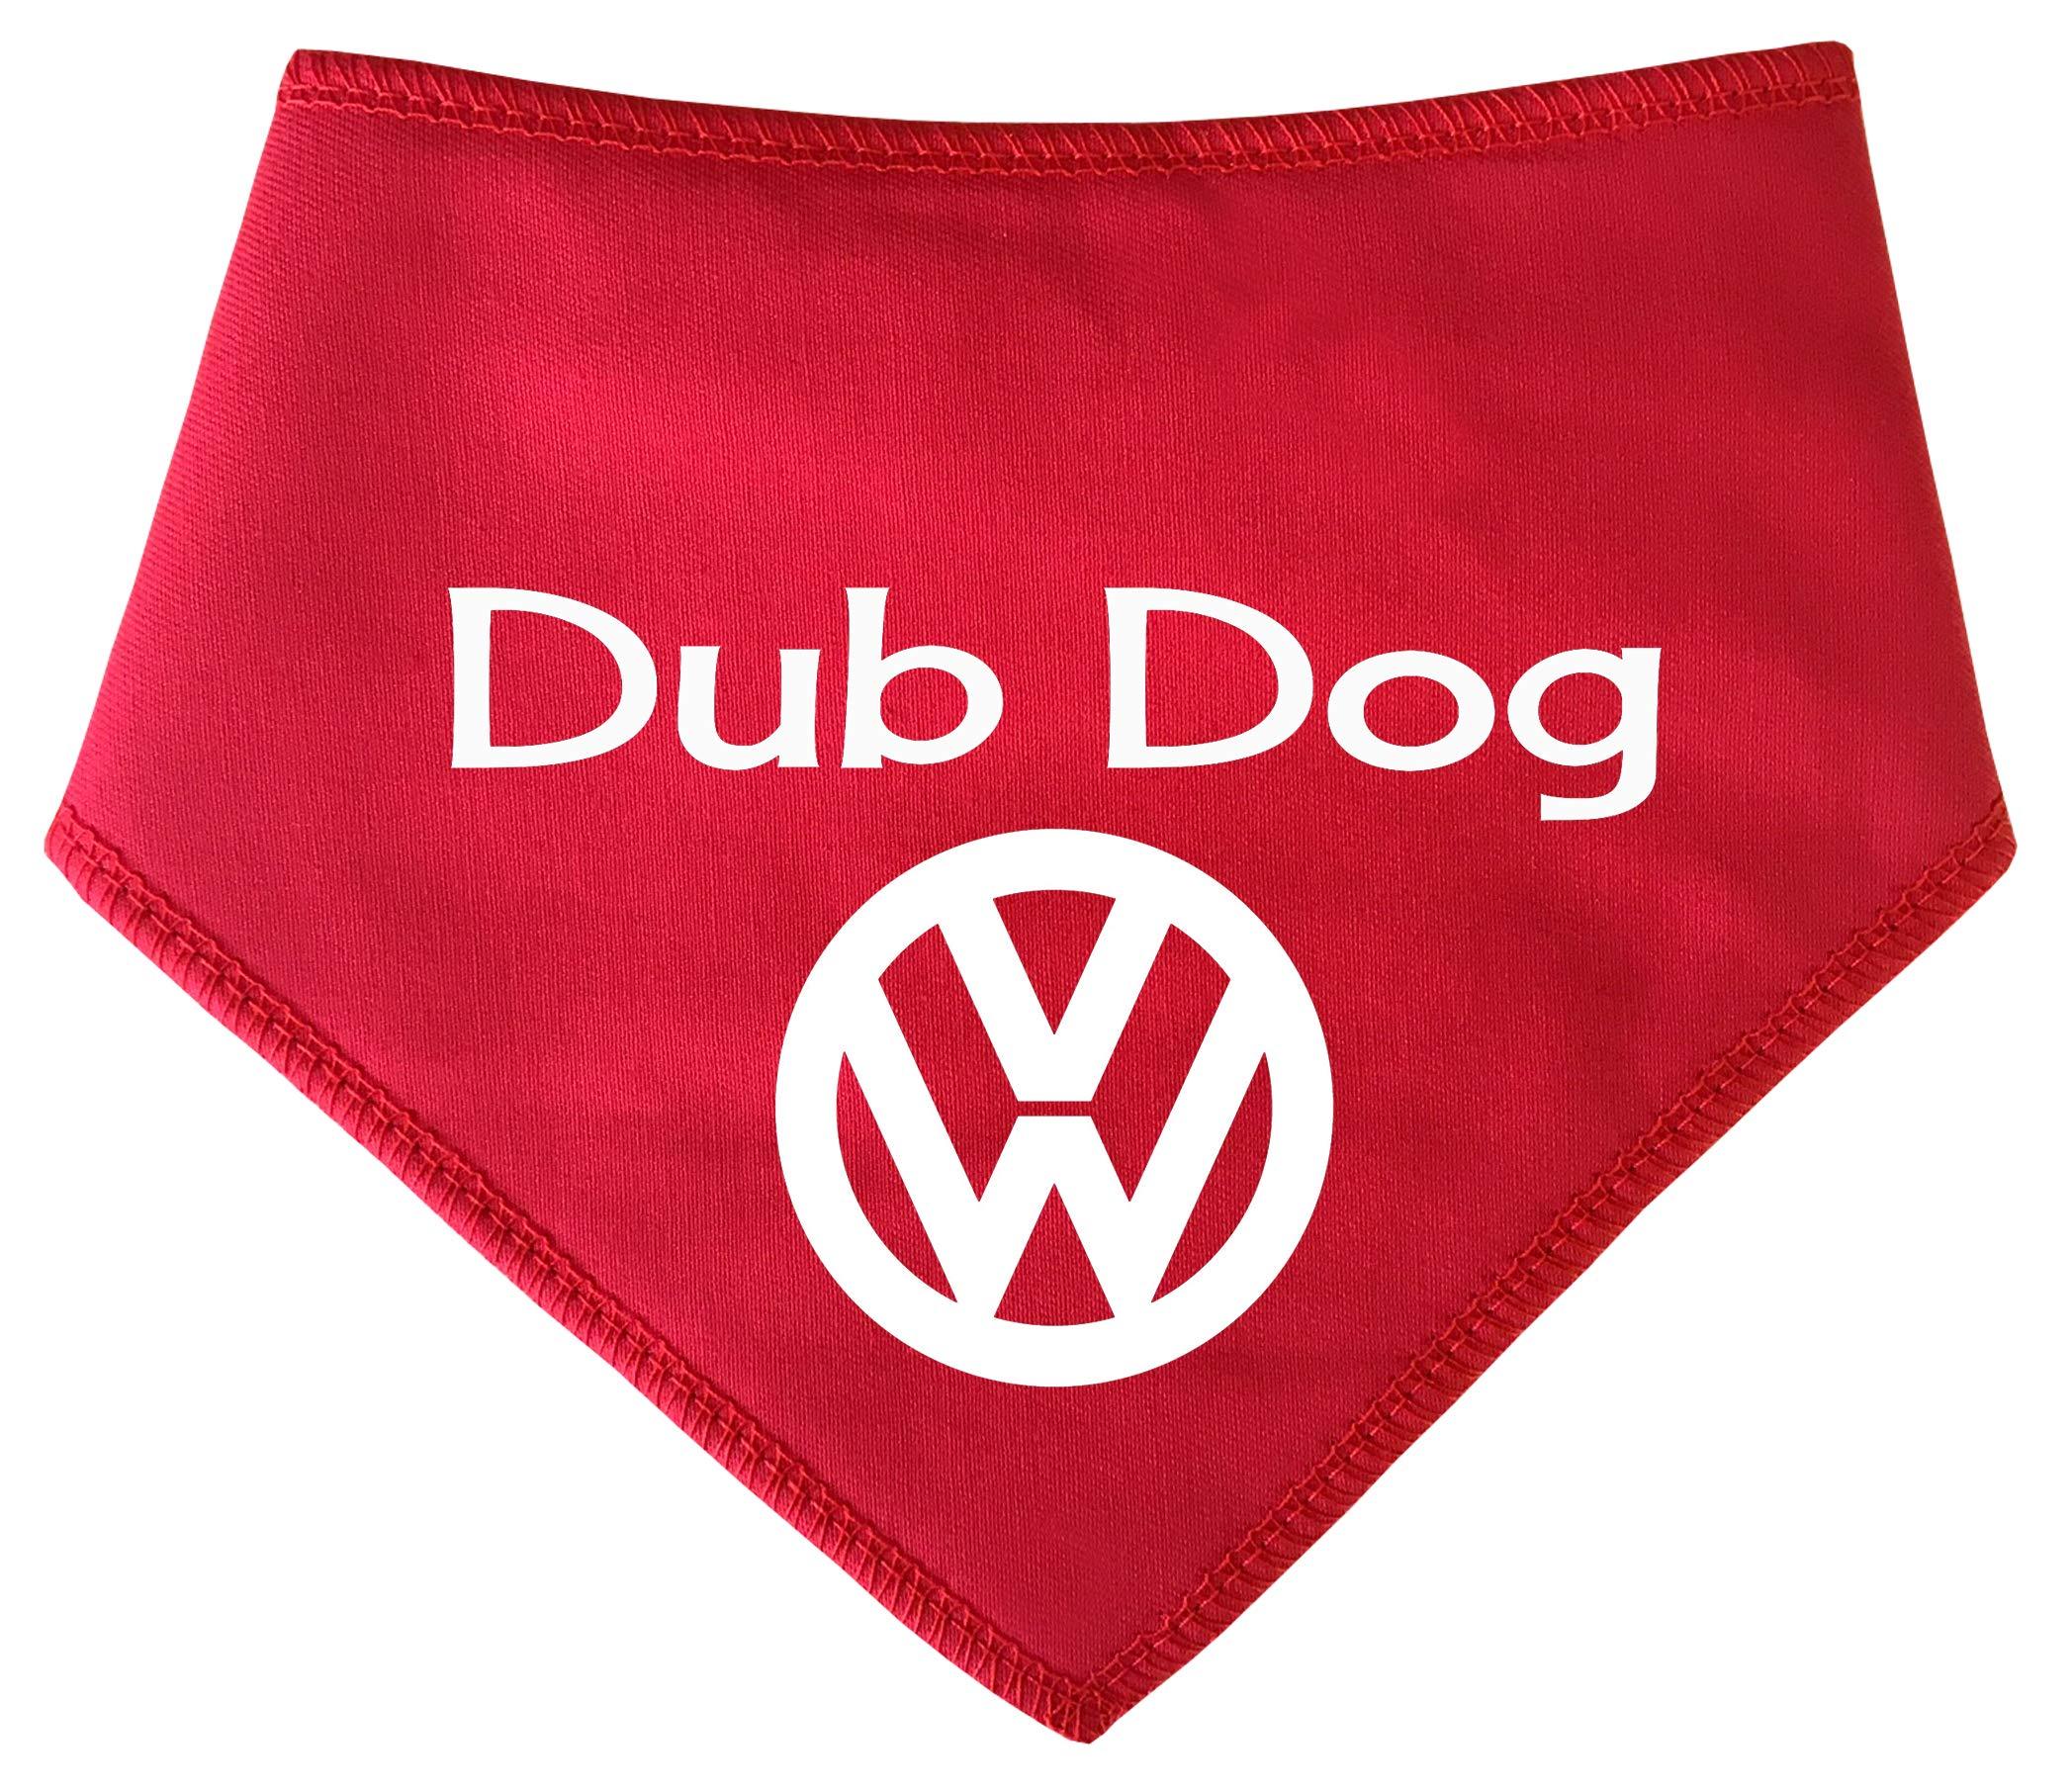 Im Getting A Human S3 Spoilt Rotten Pets Medium Dogs Dalmatians, Labrador /& Staffies Baby Pregnancy Announcement Big Reveal Black Dog Bandana